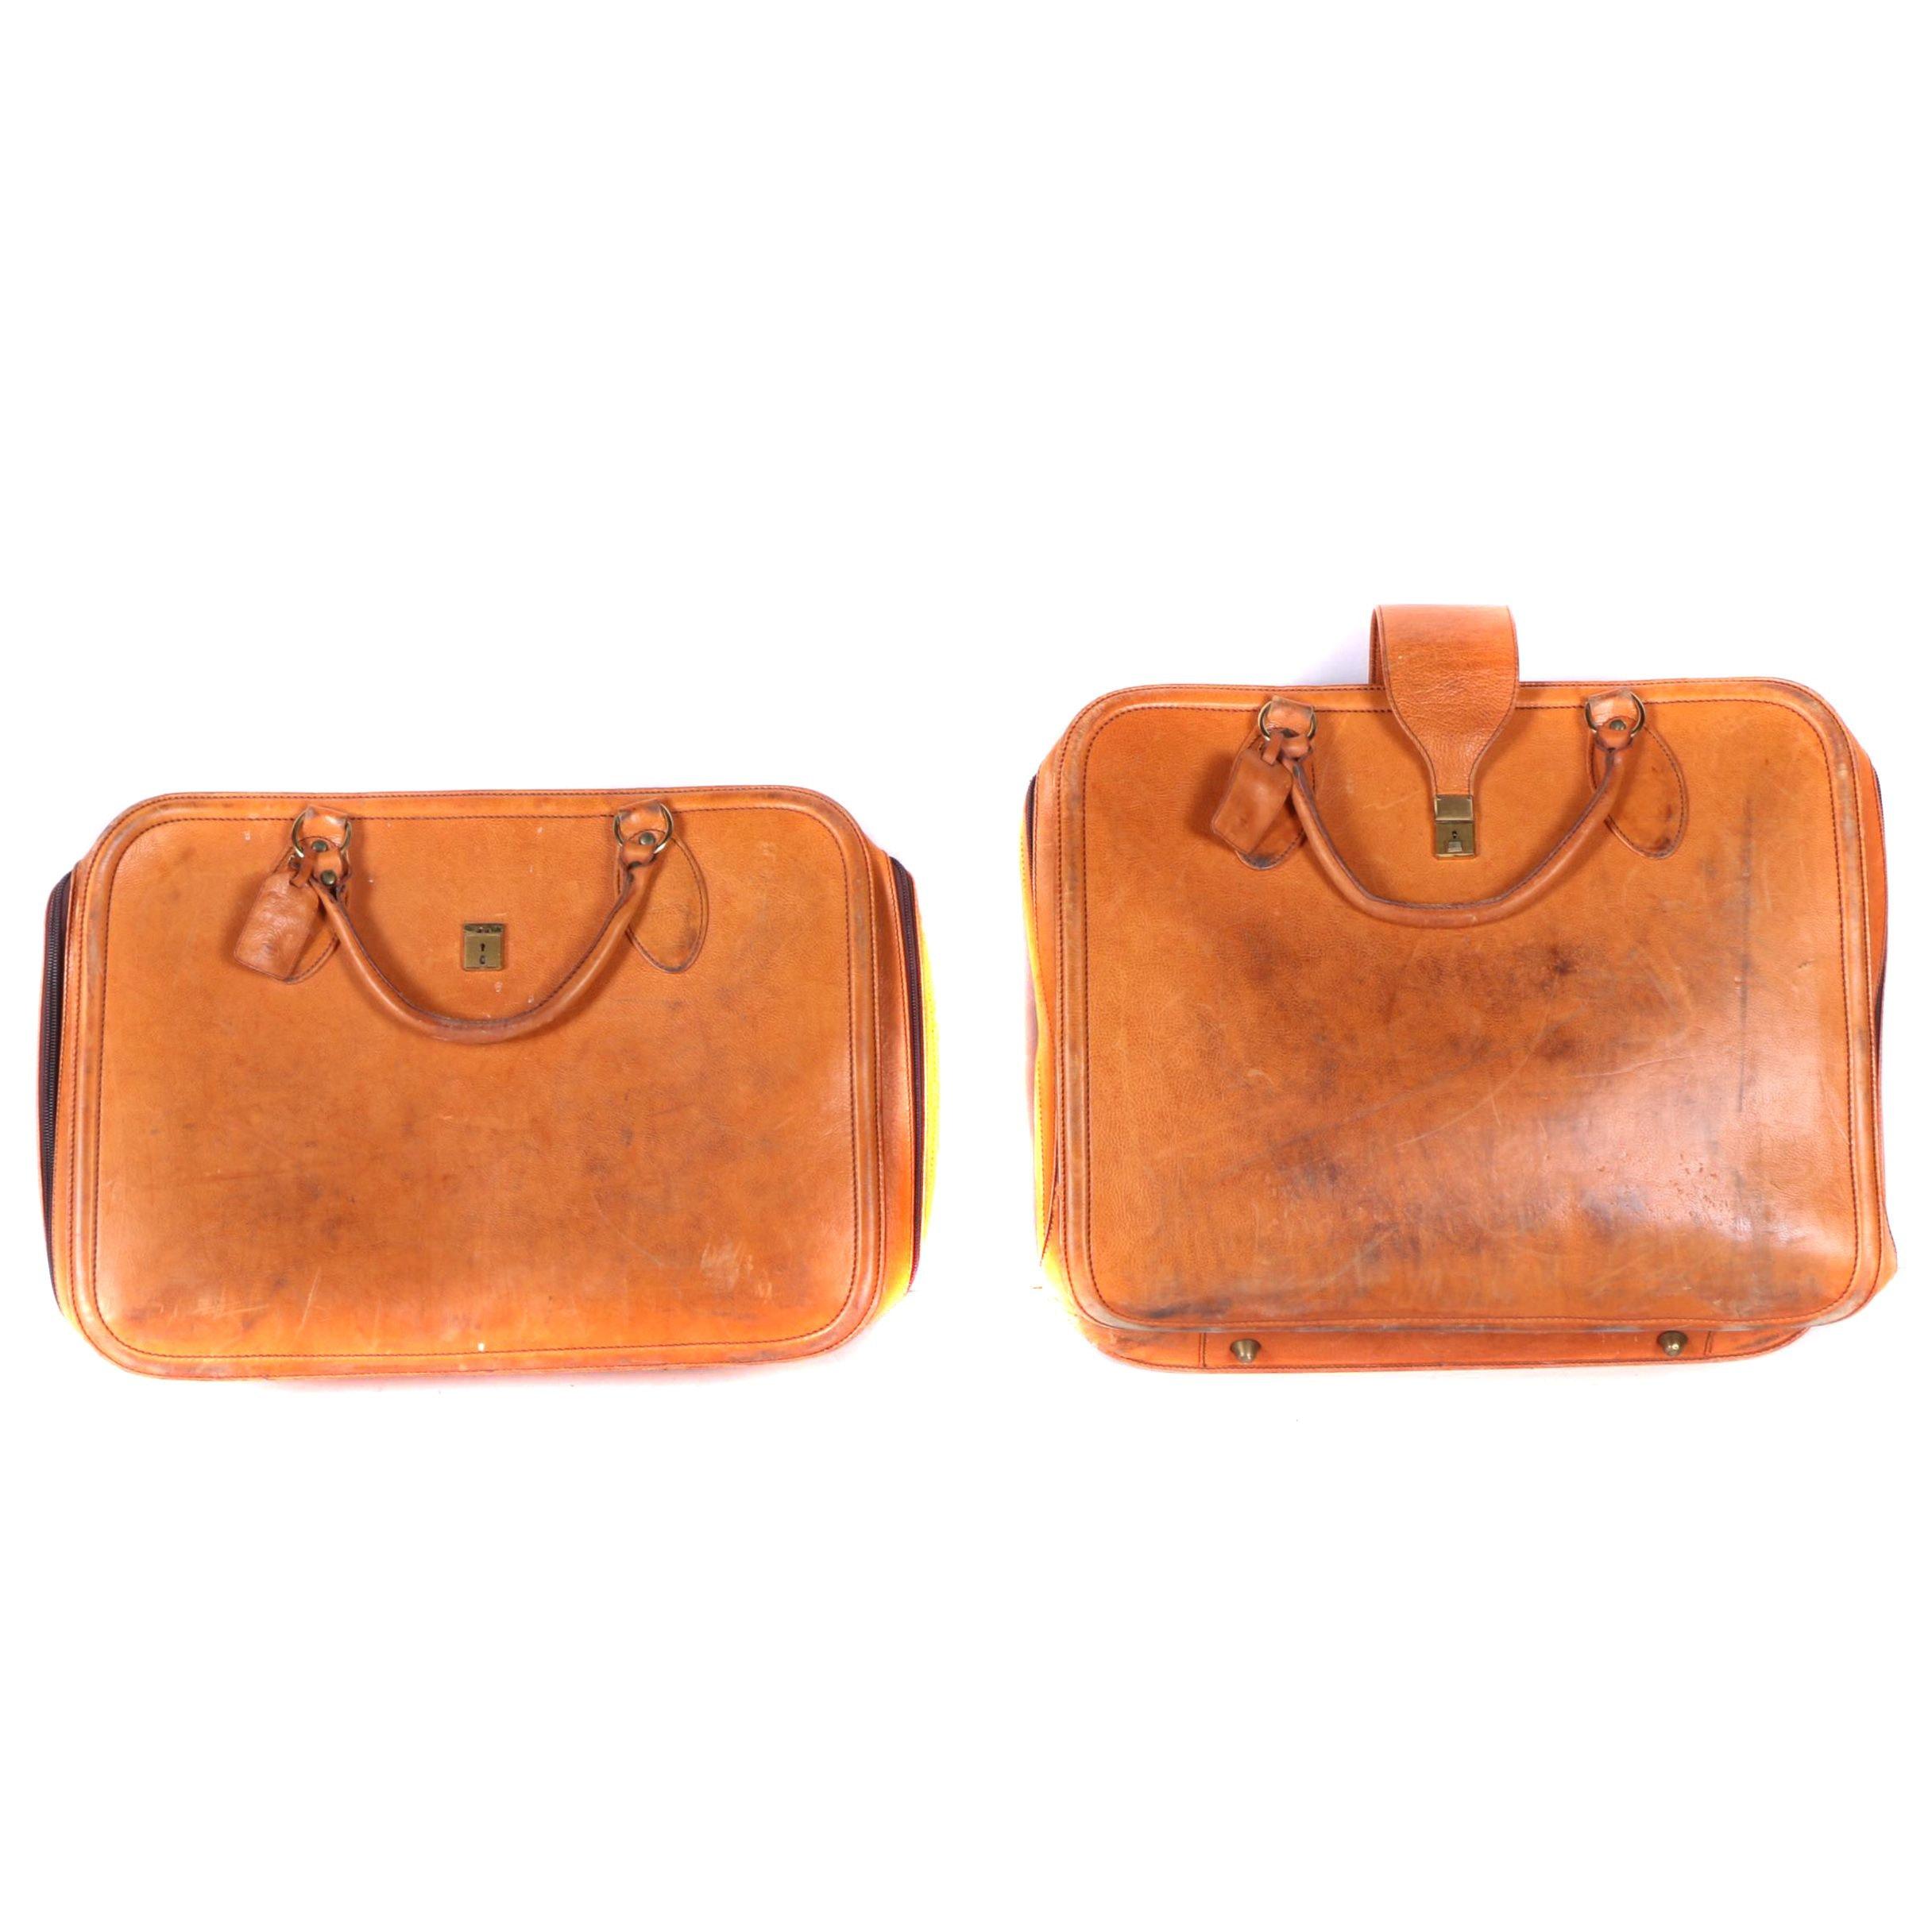 Vintage Schedoni Luggage